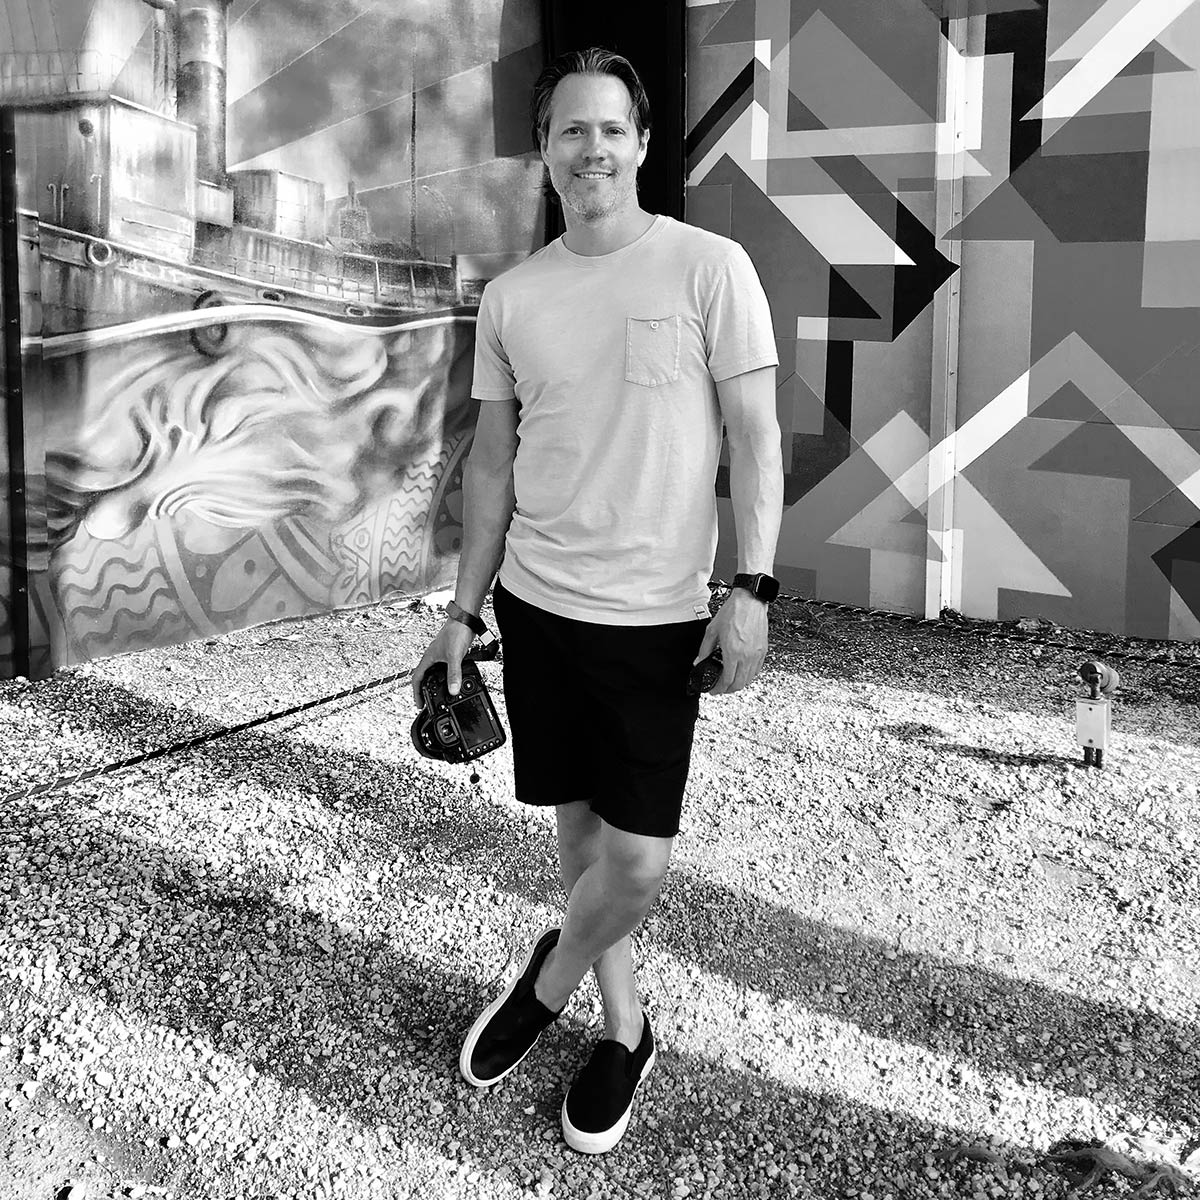 Jeremy-Frechette-Portrait-Miami-Graffiti-IMG_1164.jpg